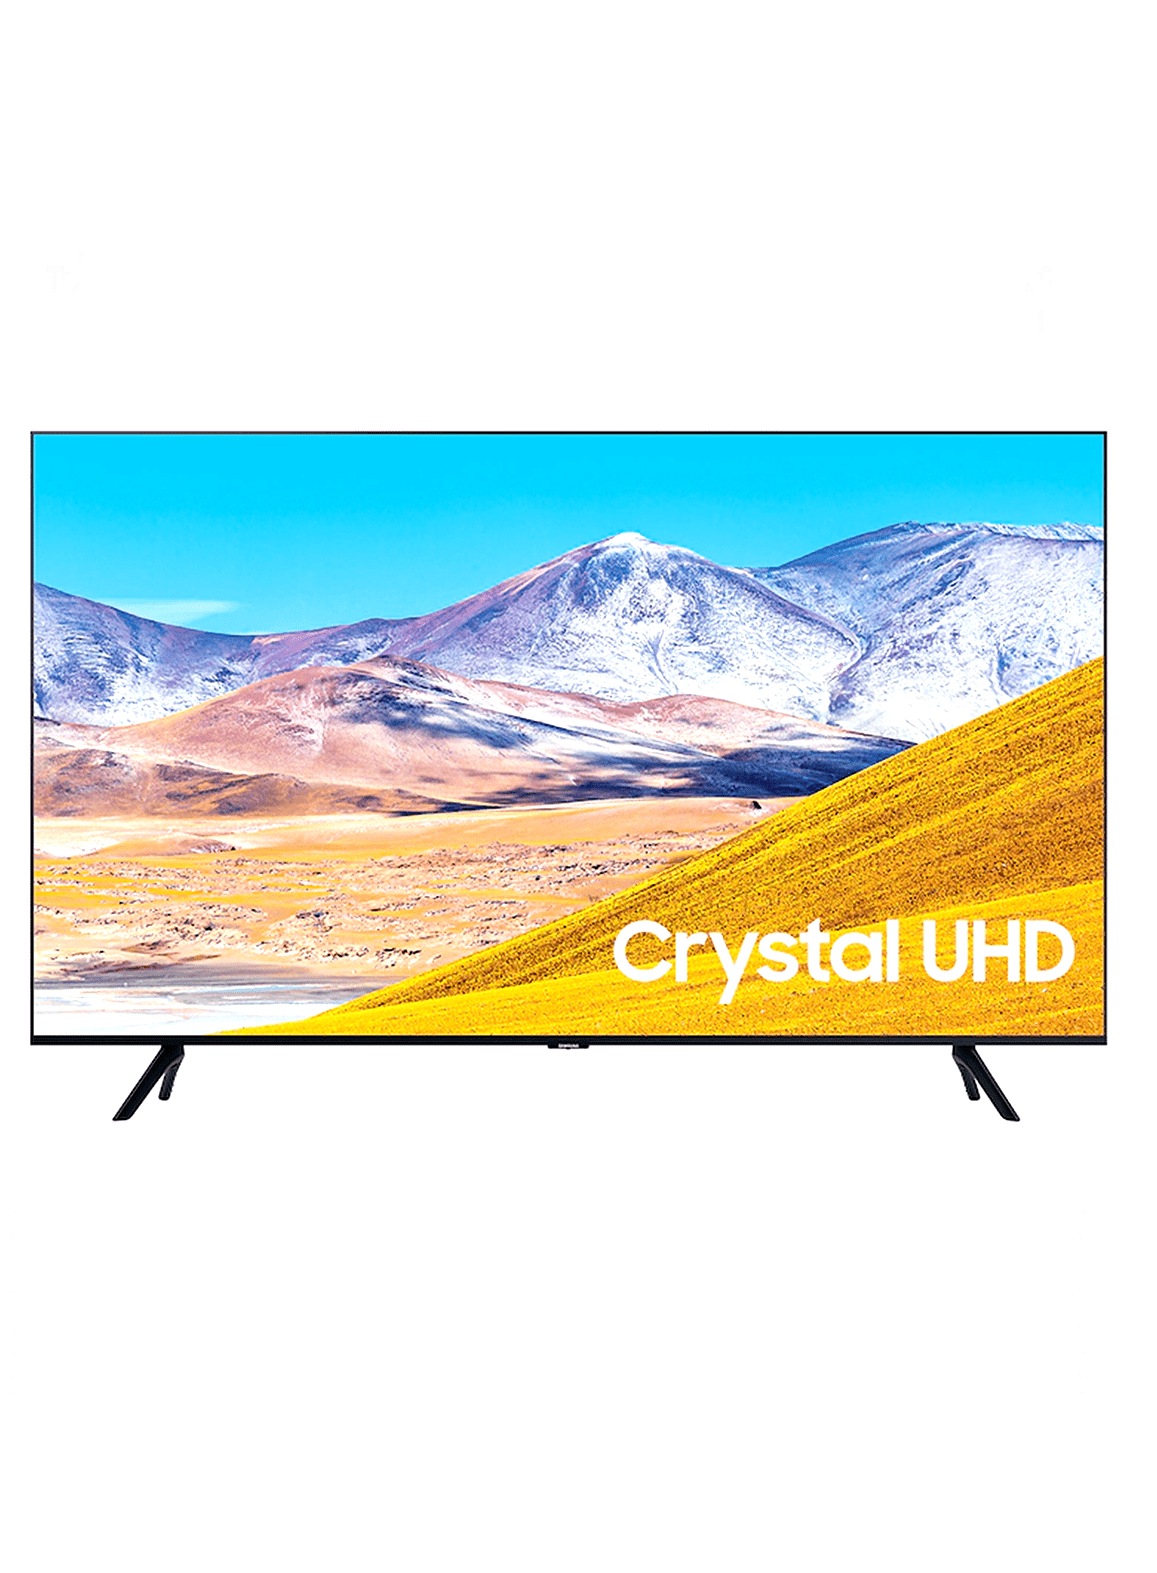 Samsung 55 TU8000 4K Smart Crystal UHD TV شاشة